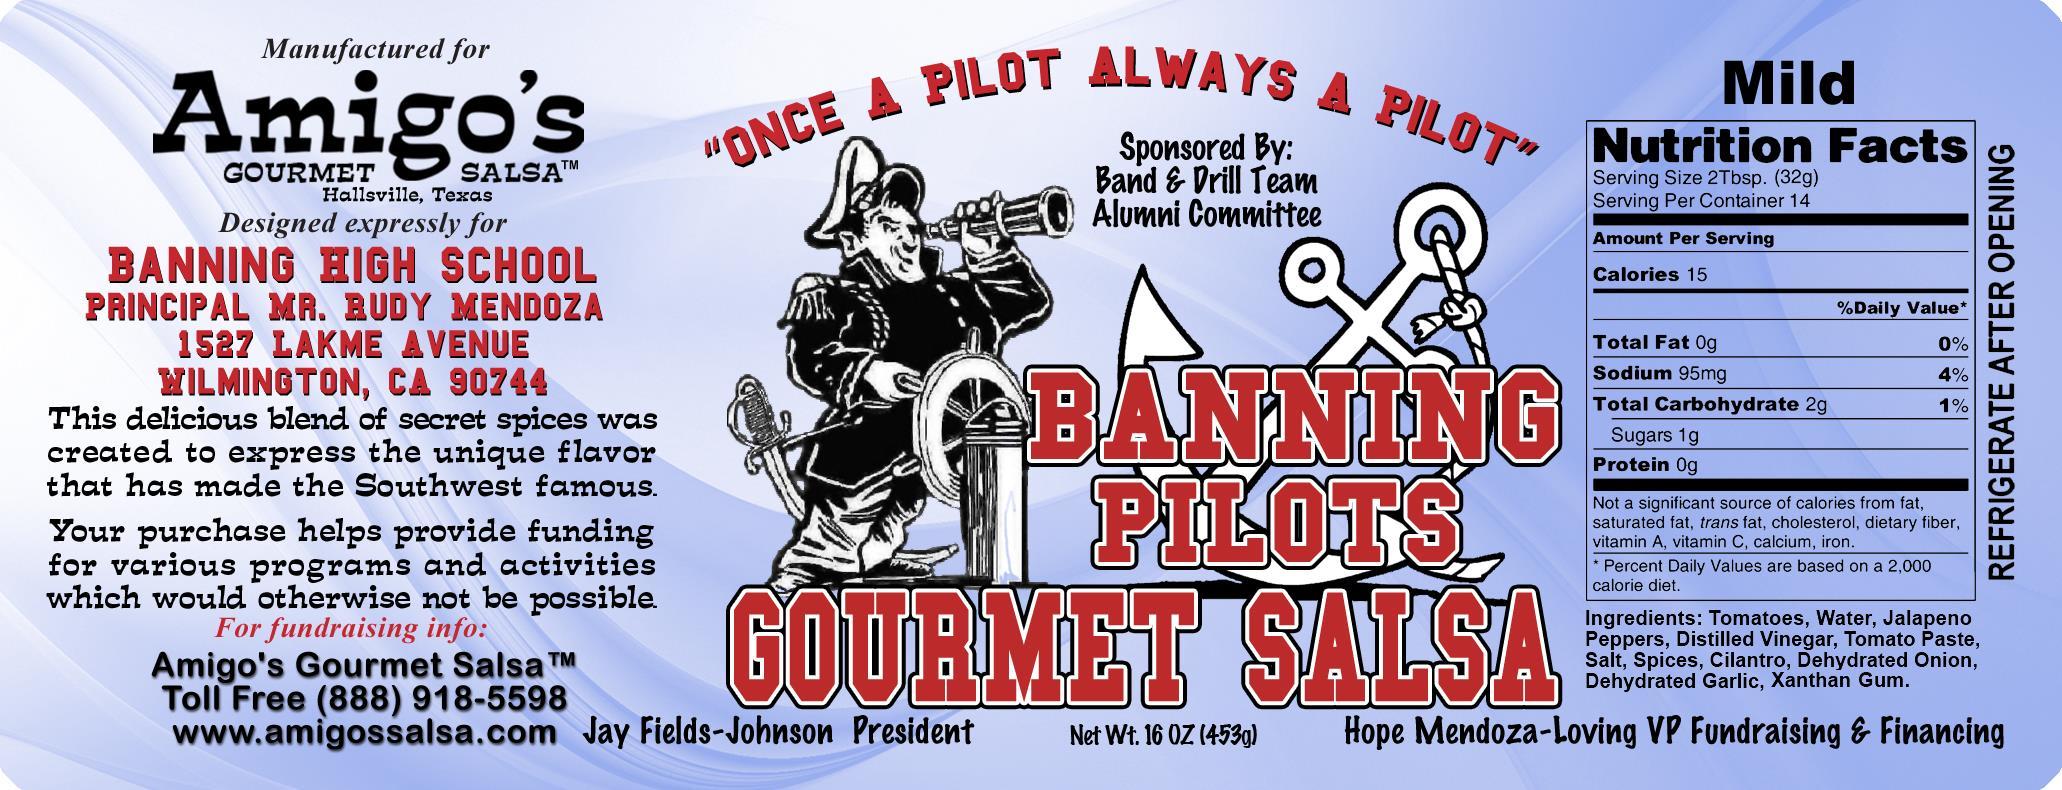 Banning High School Pilots Band Jar Label MILD.jpg